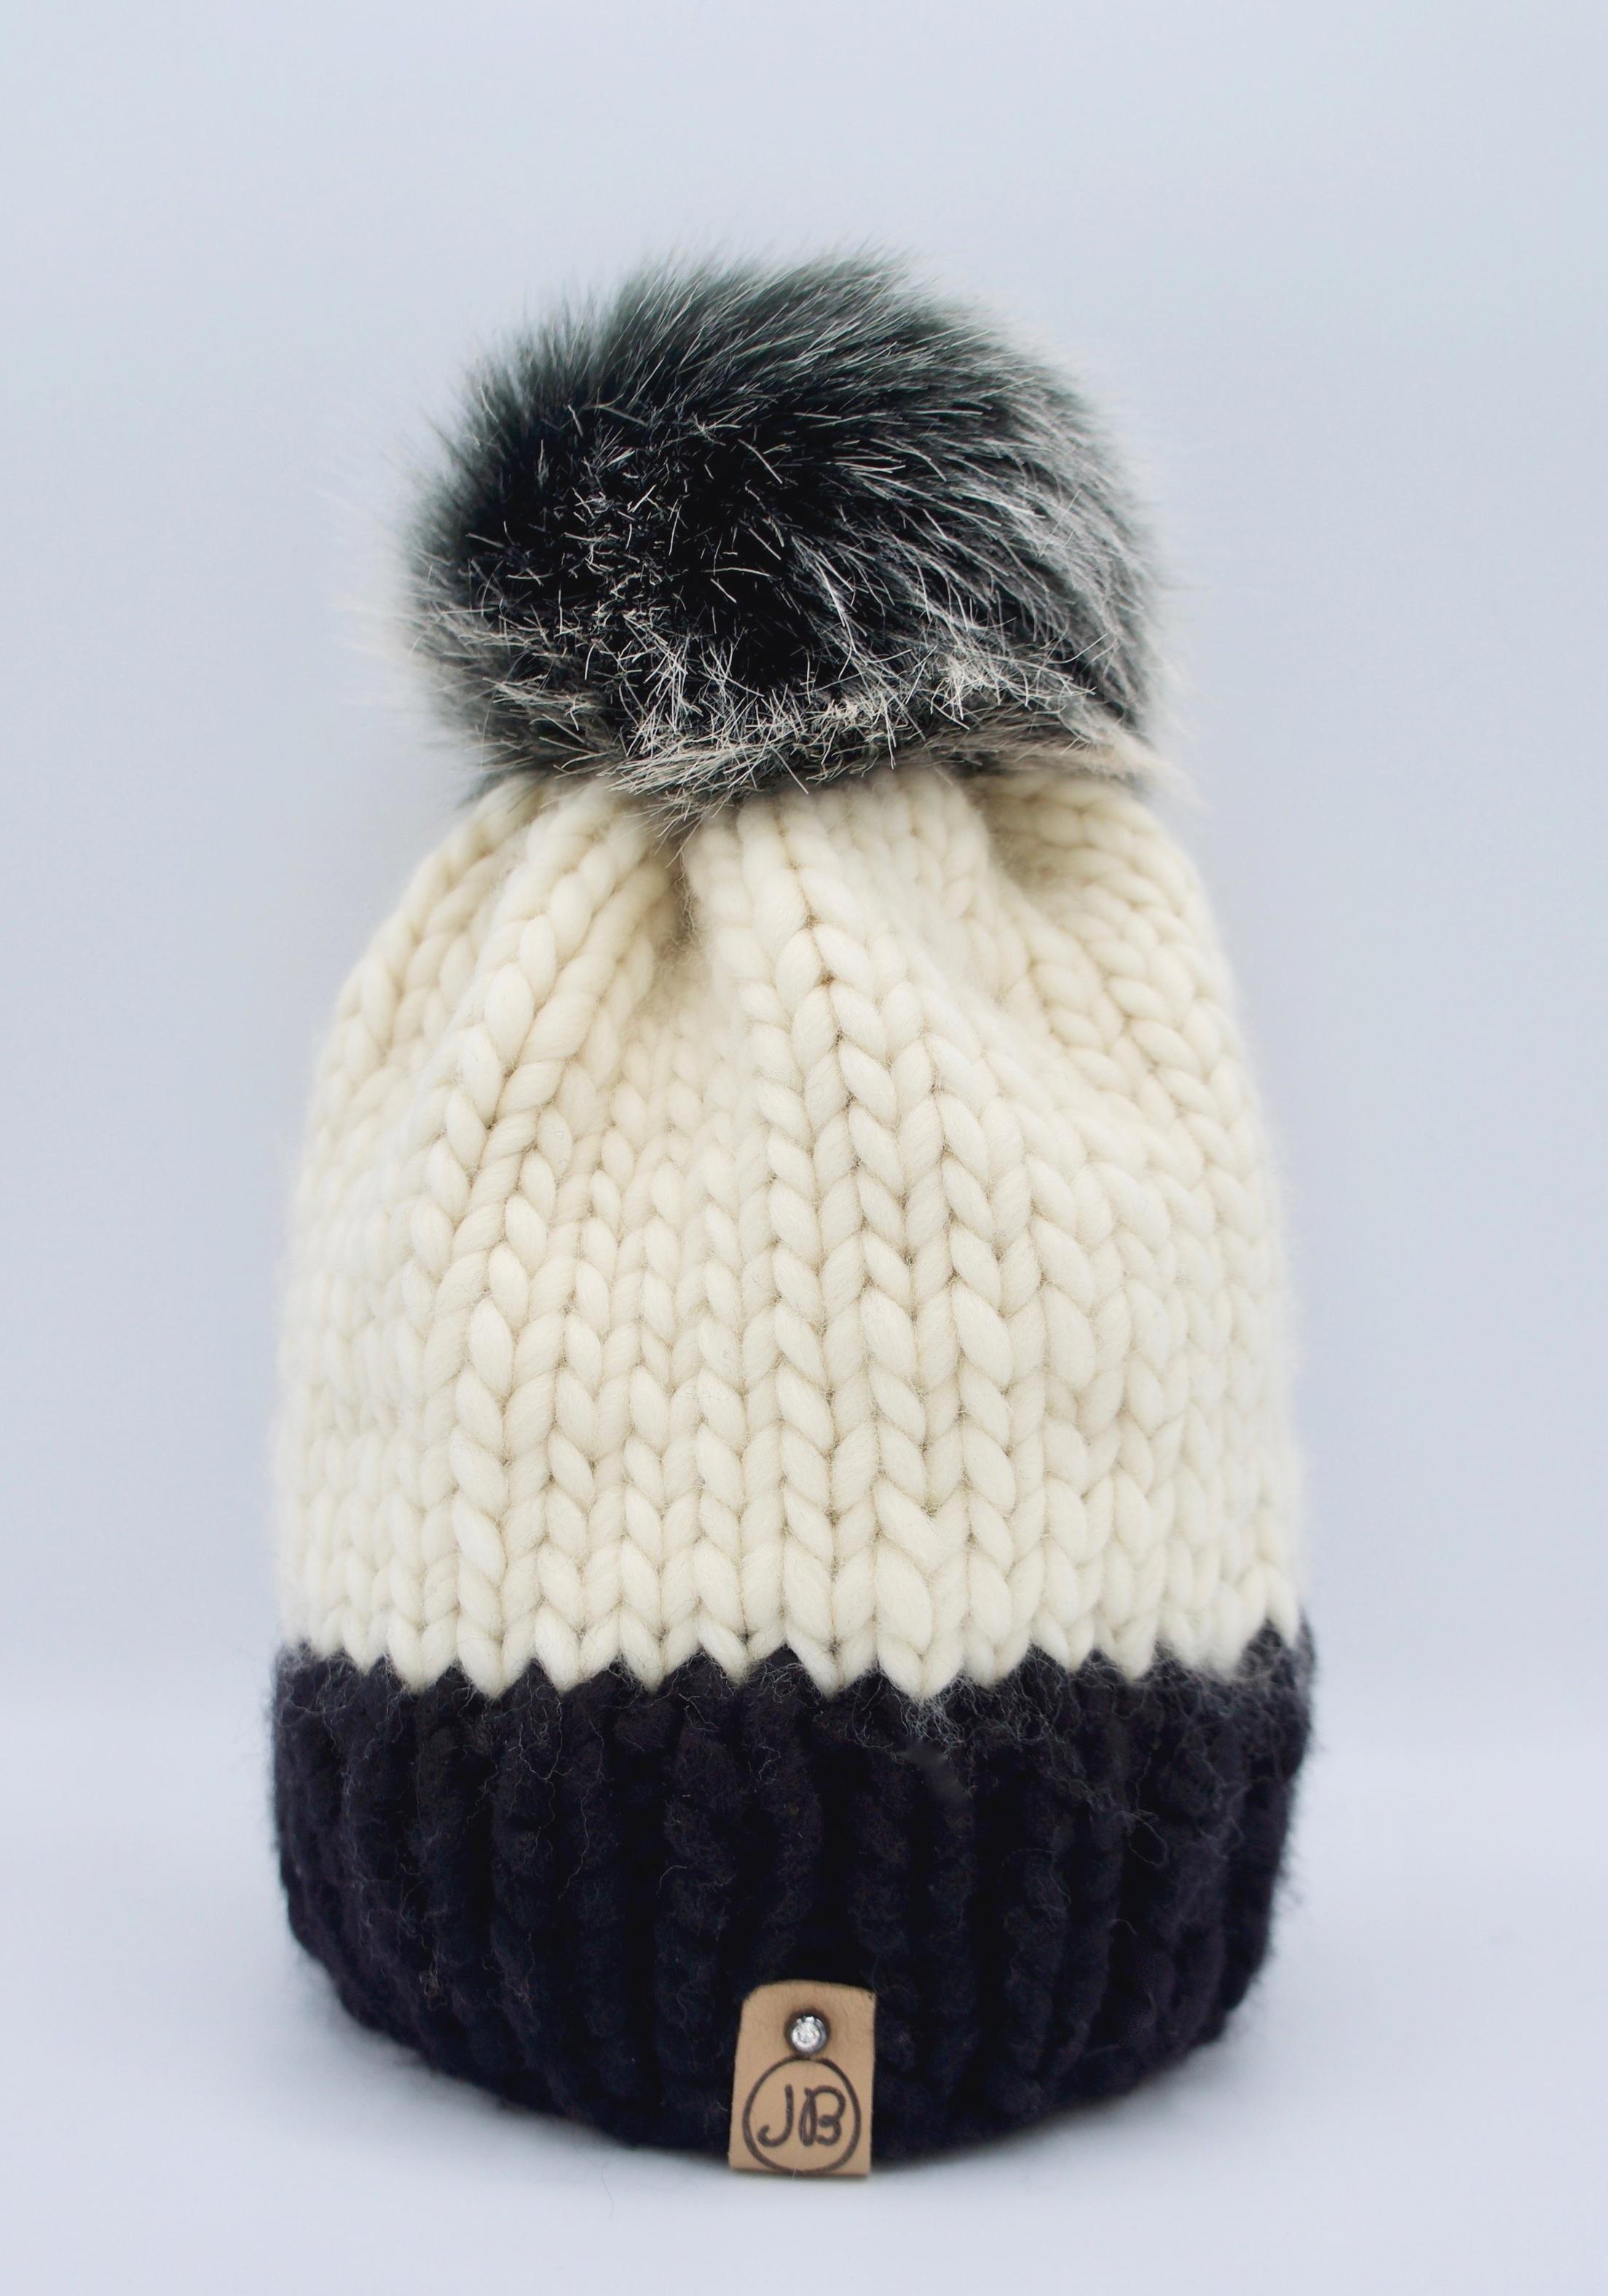 Beanie Hat with Detachable Pompom Natural Caramel & Black $115.00